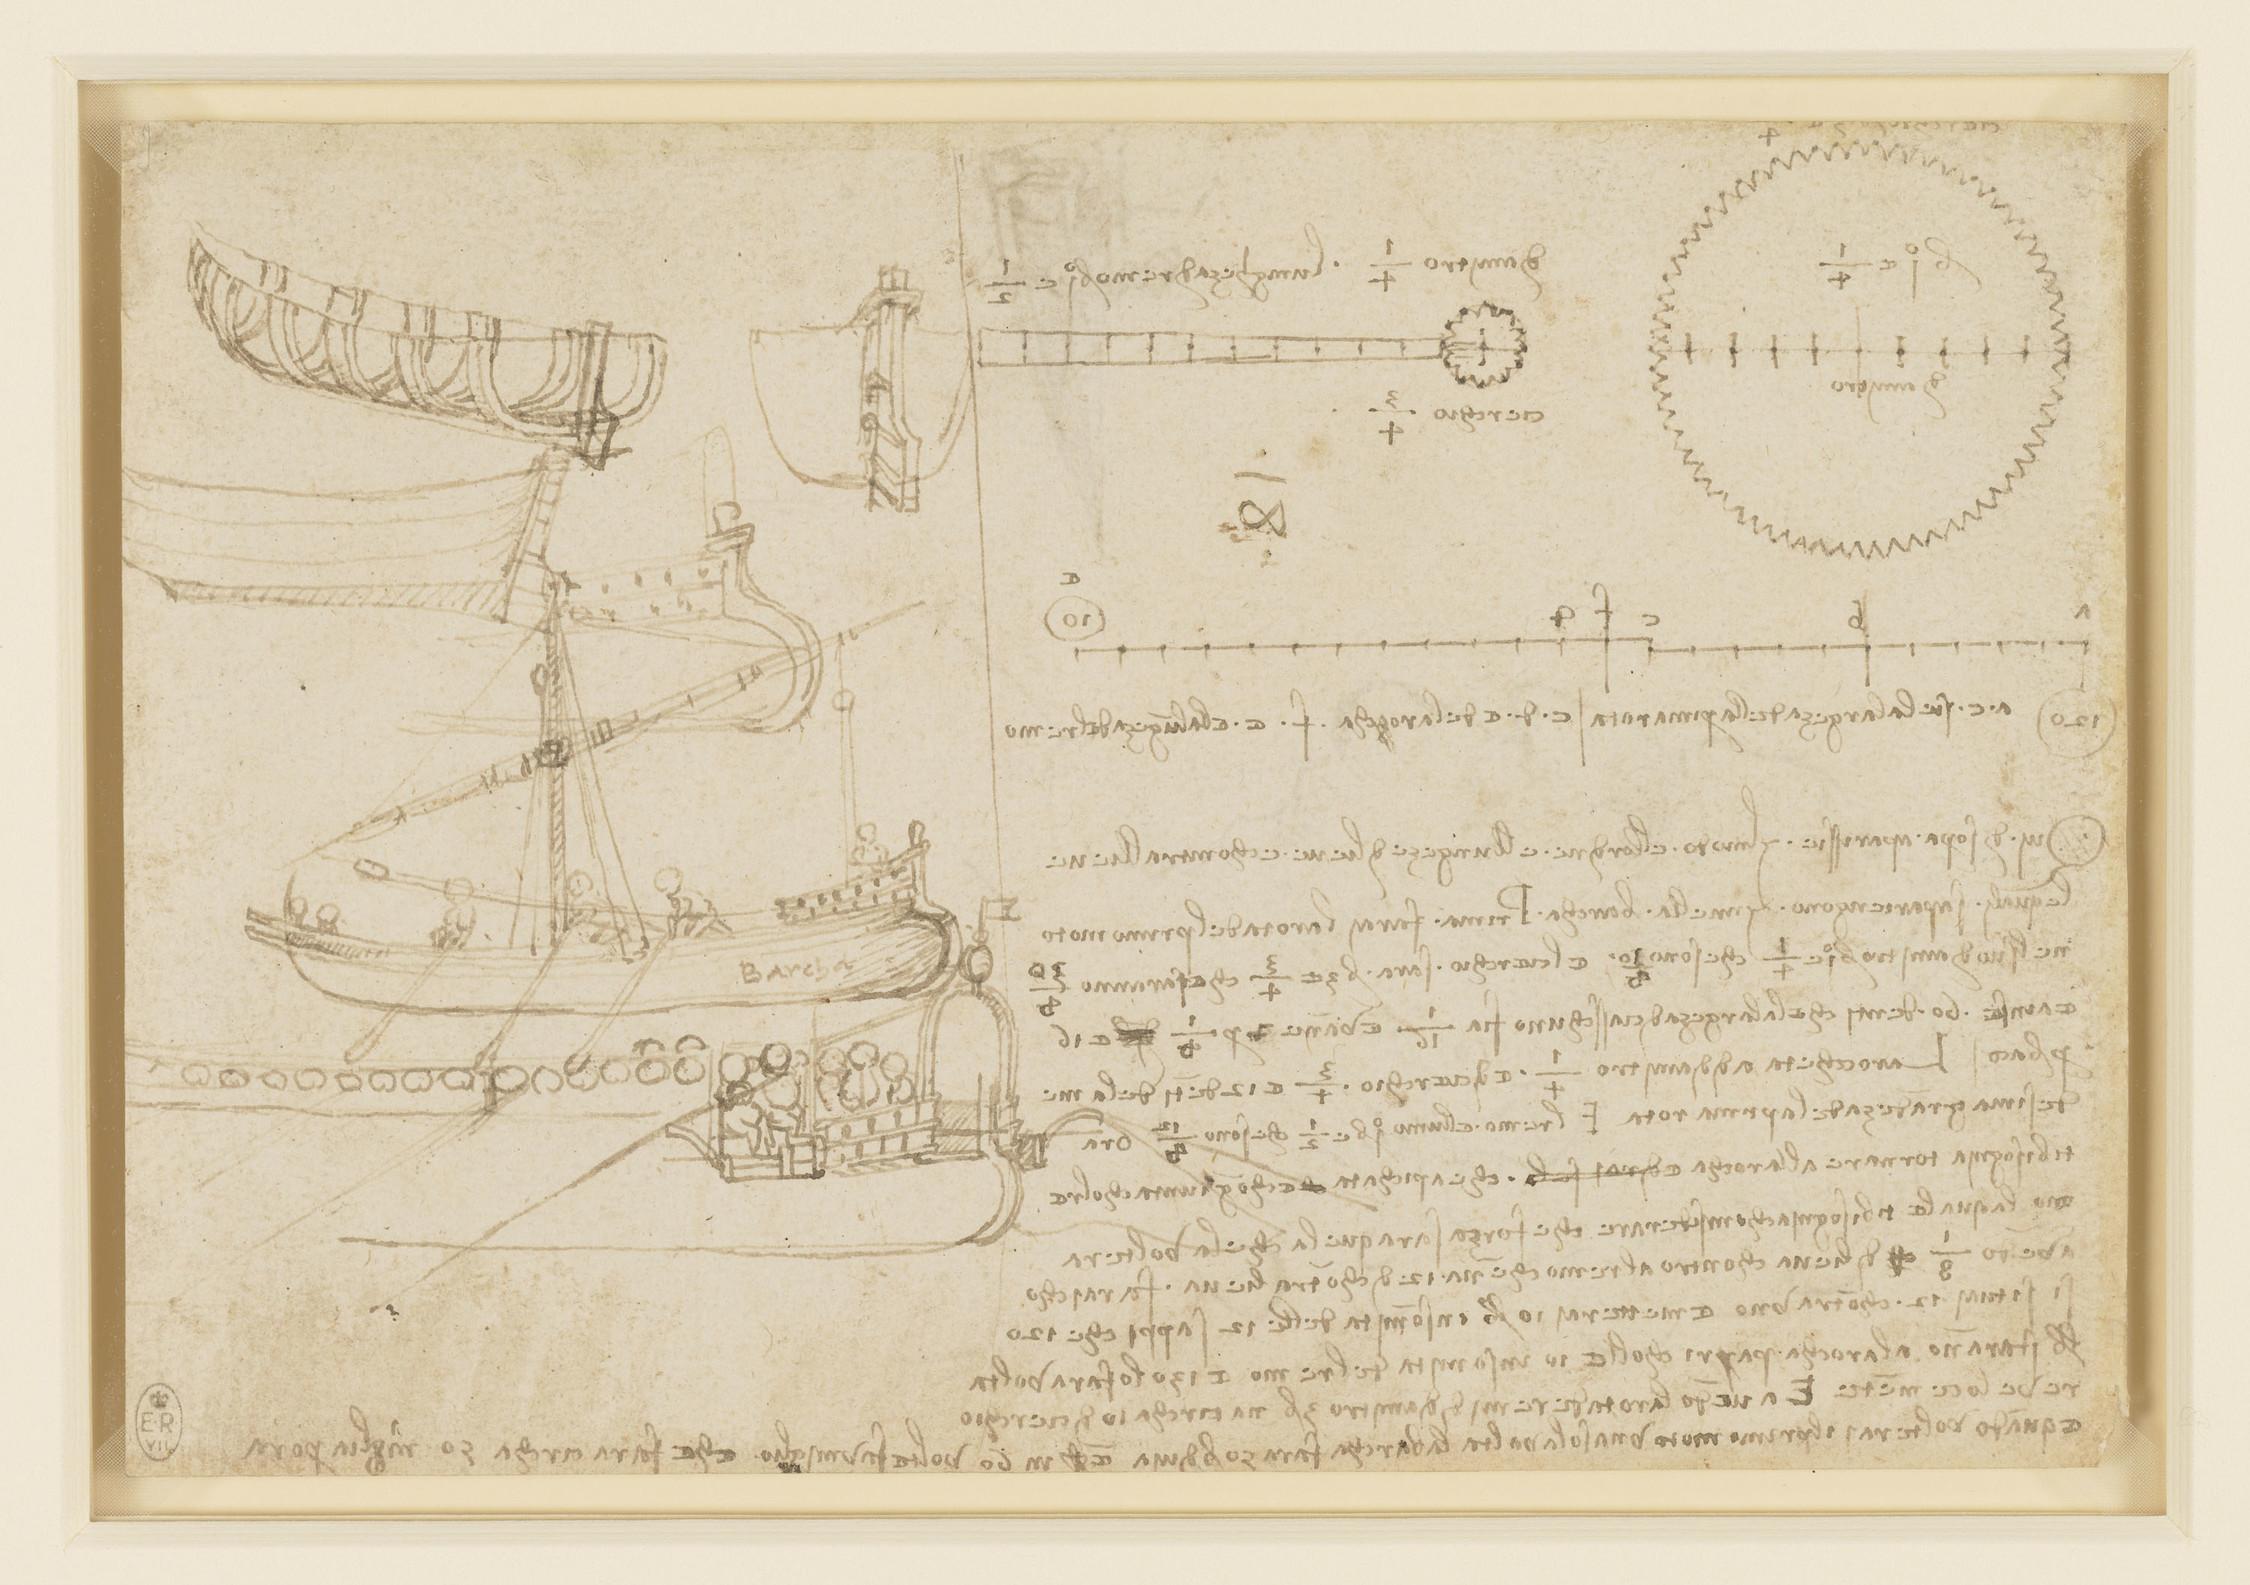 leonardo da vinci  vinci 1452-amboise 1519